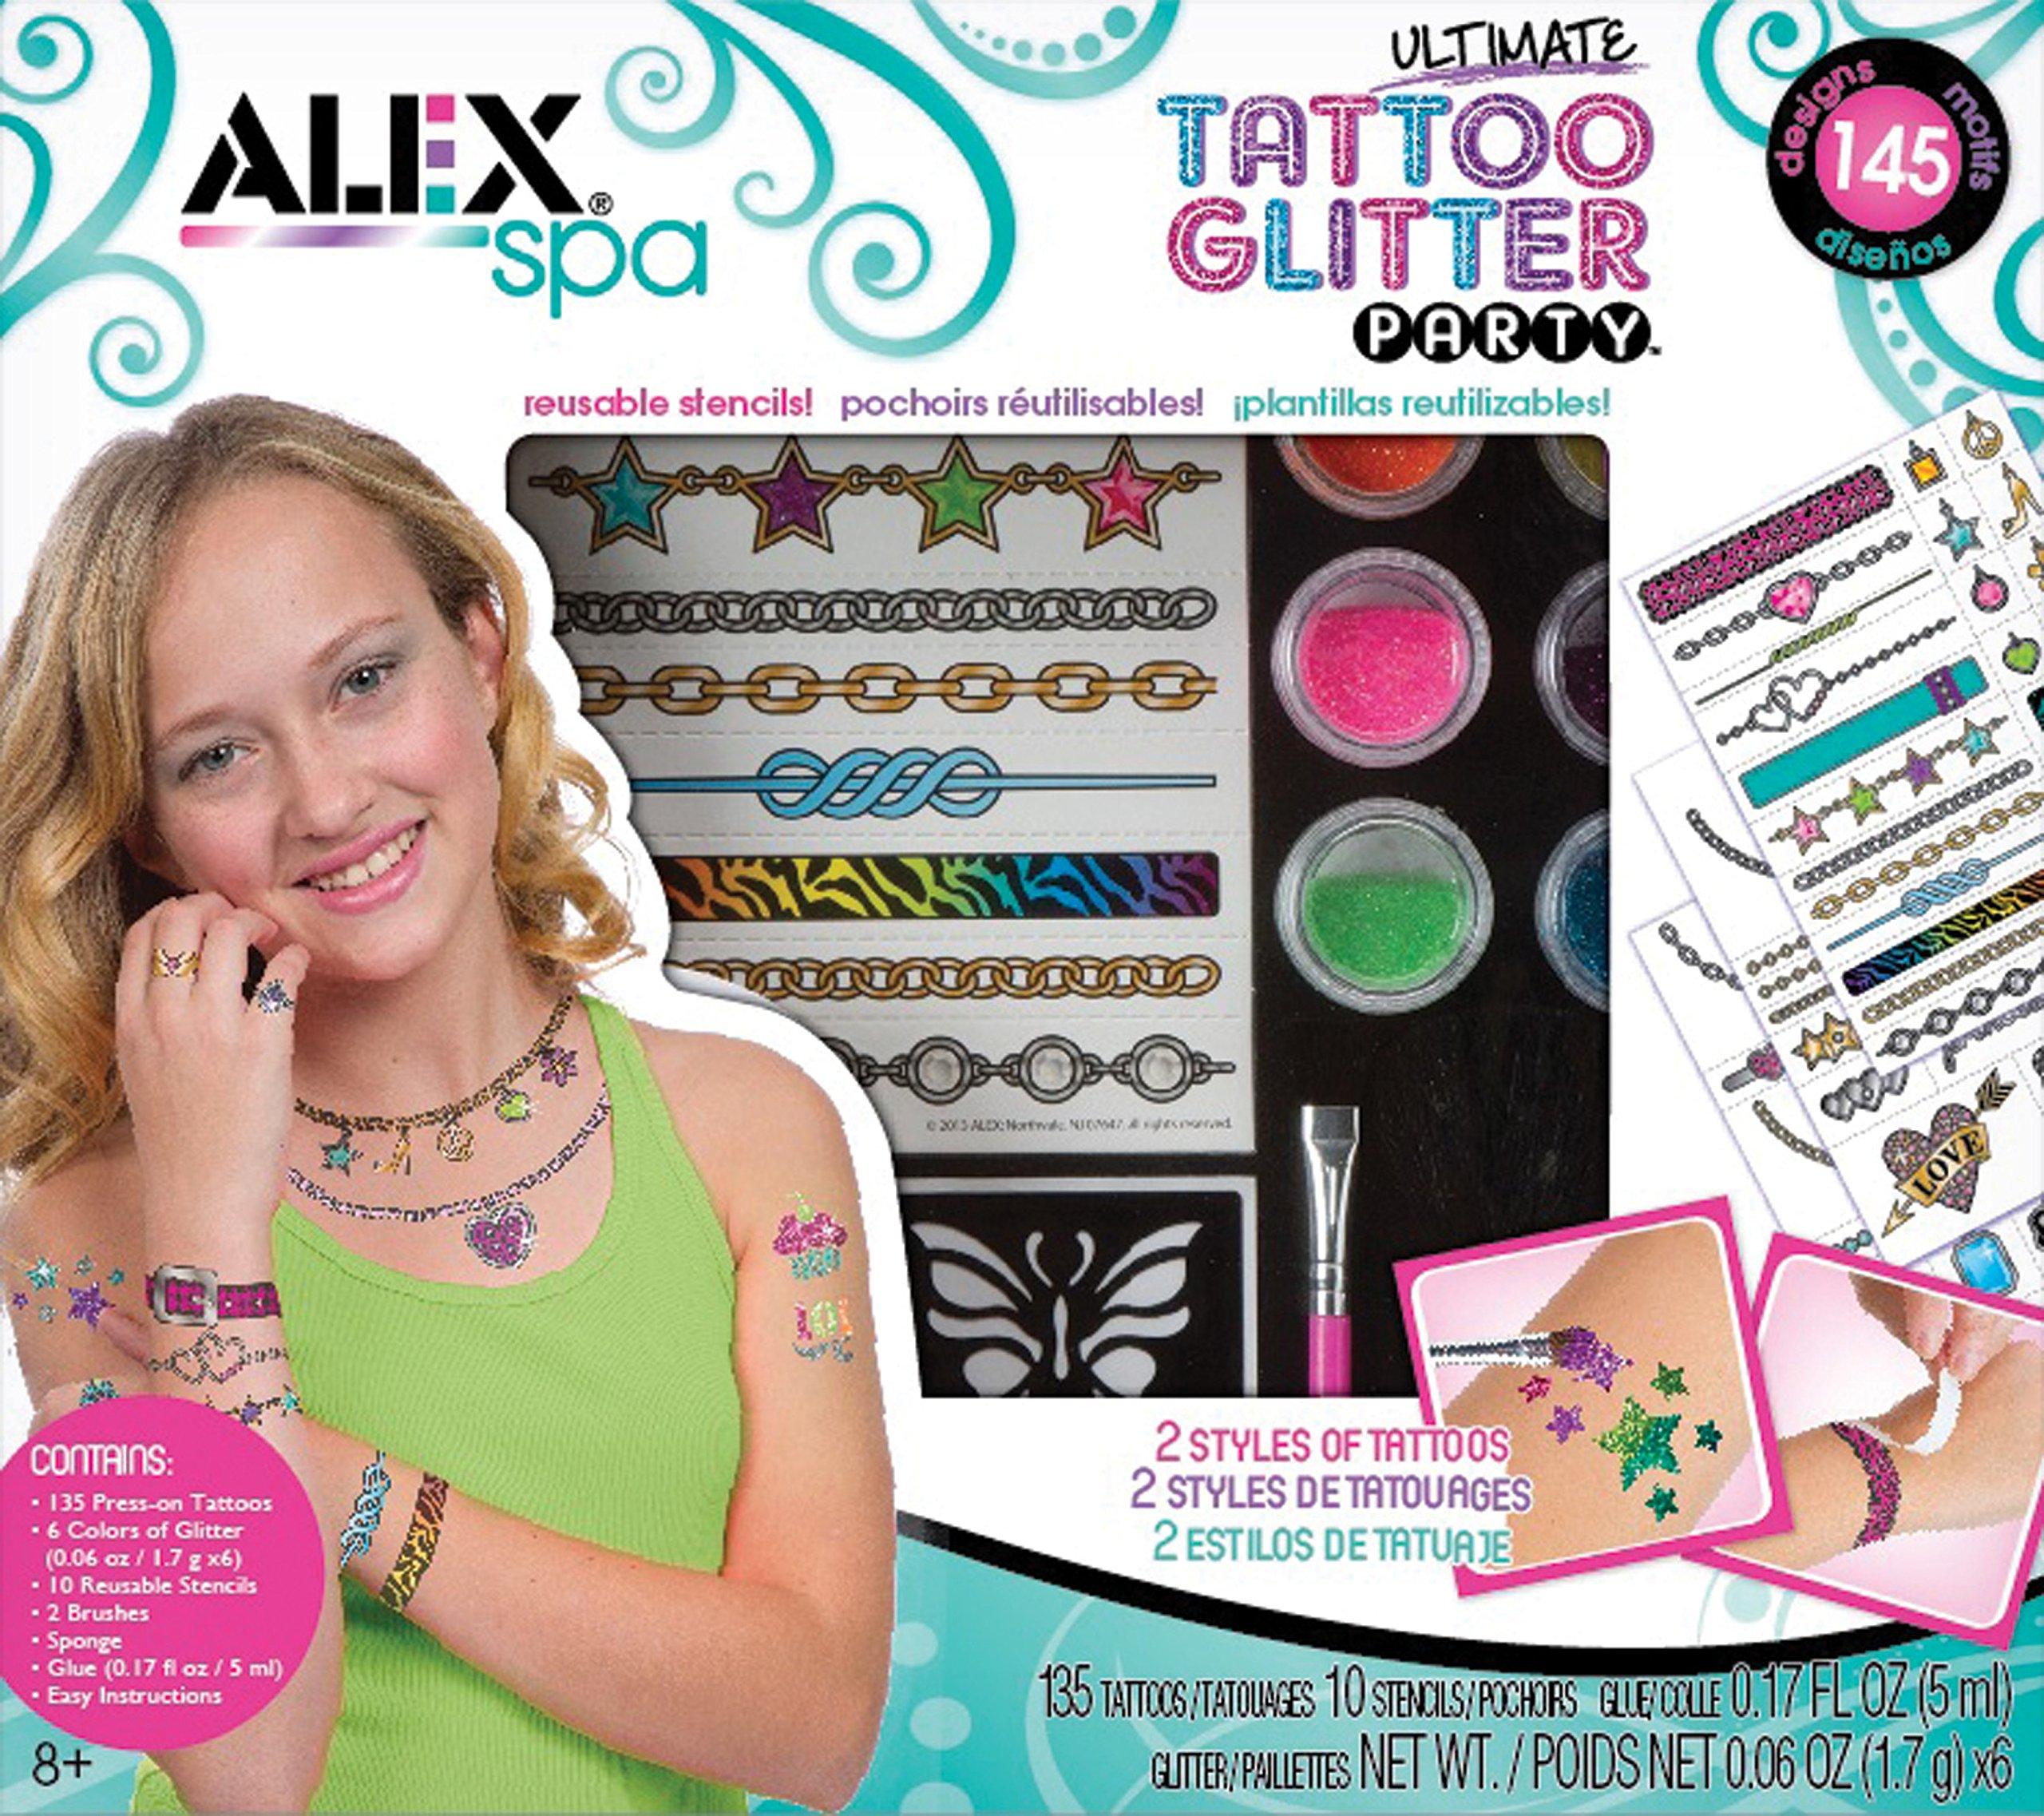 ALEX Toys Spa Ultimate Glitter Tattoo Party Craft Kit